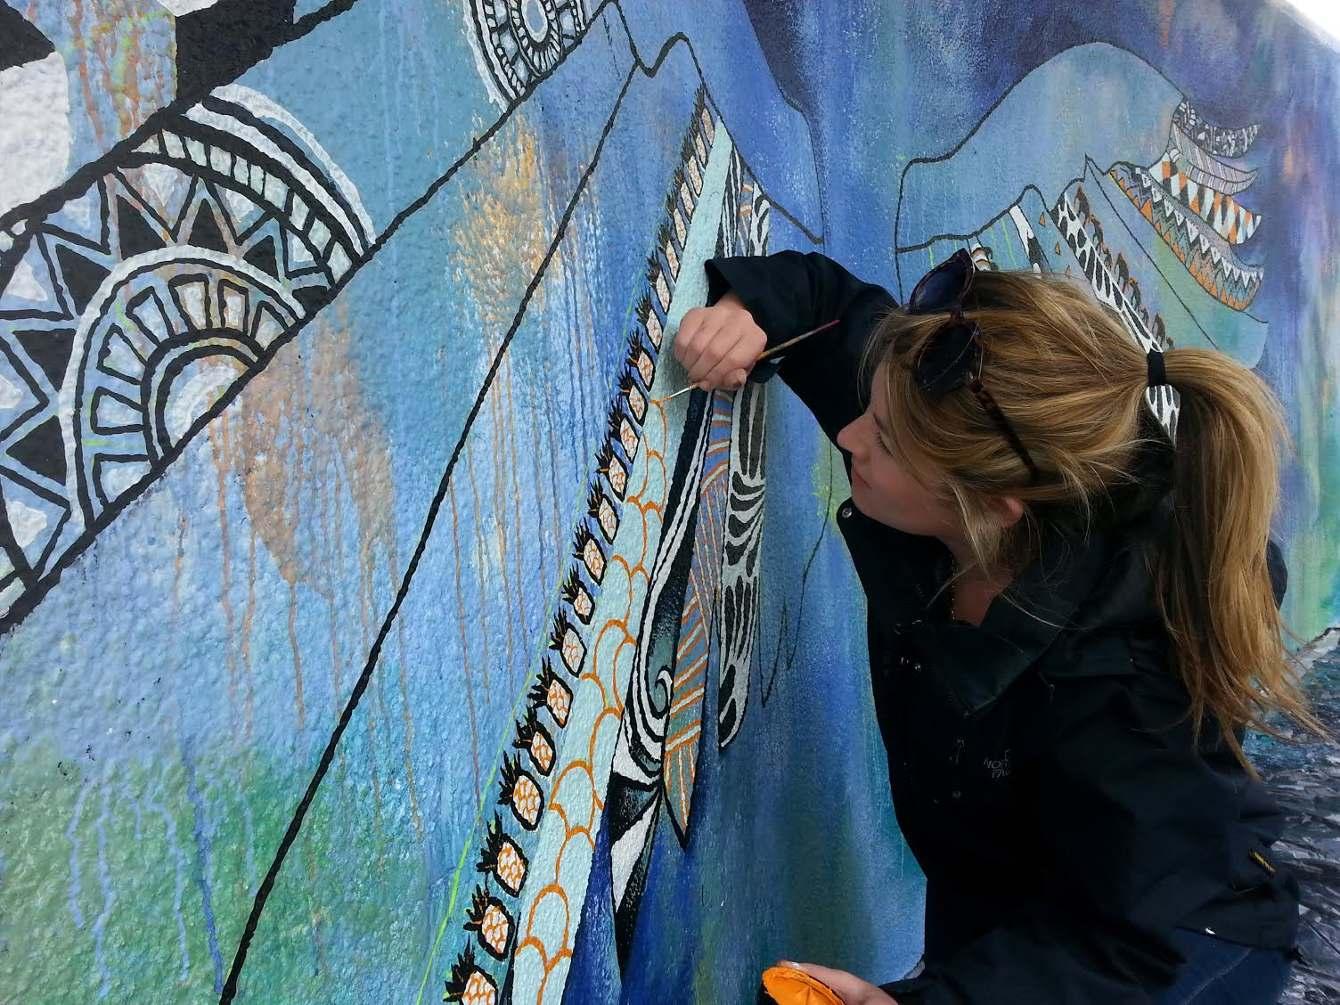 downtown_tauranga_wings_mural_progress-4.jpg